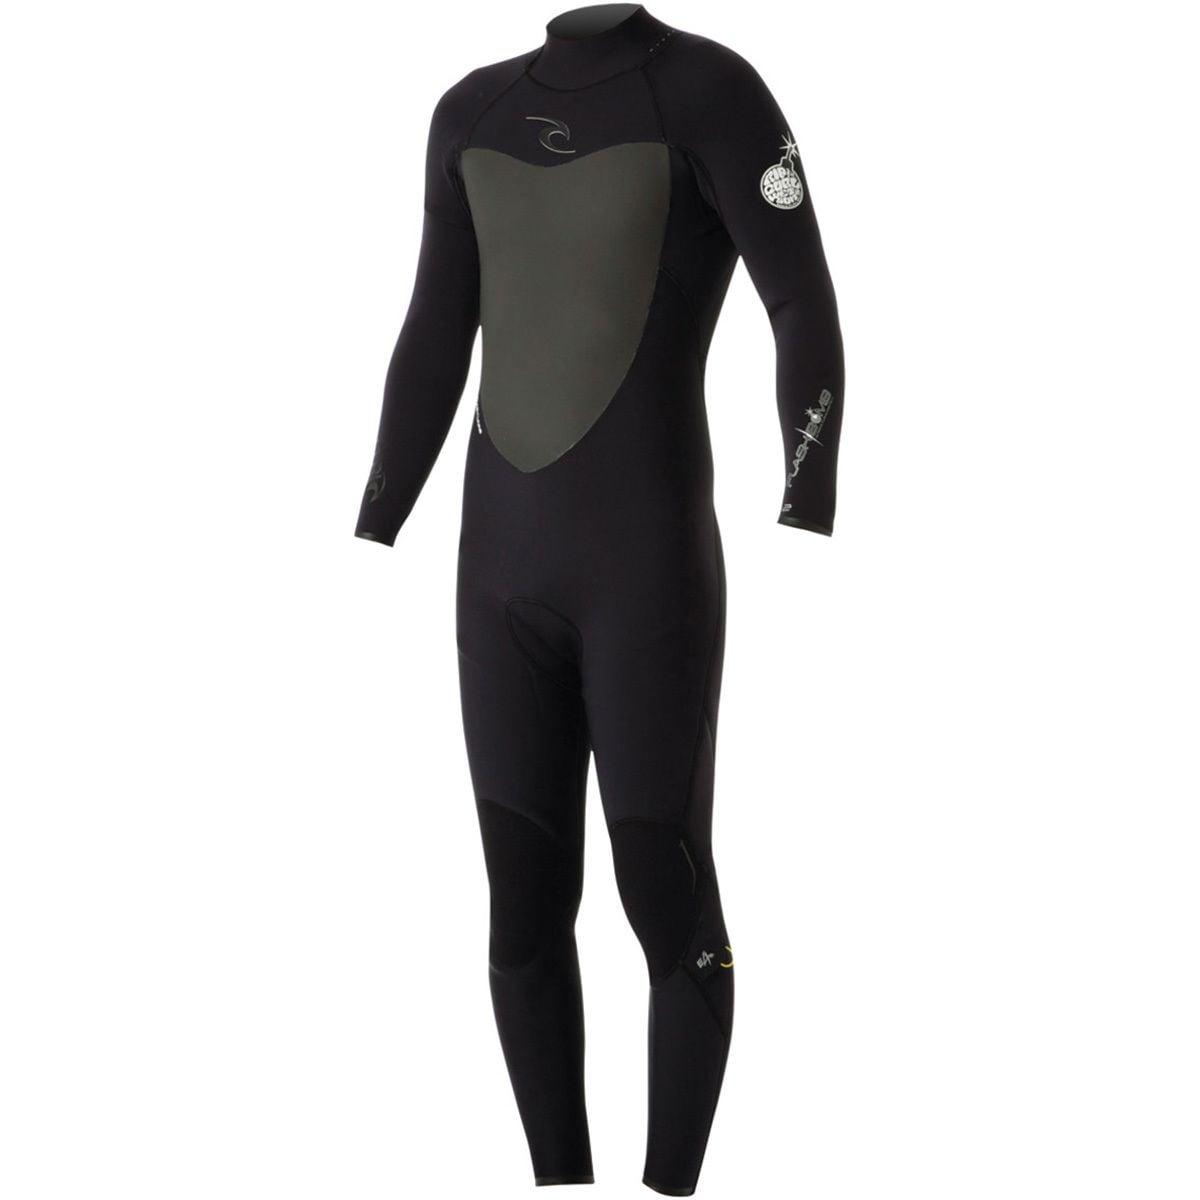 Rip Curl 4 3 Flash Bomb Back Wetsuit  Mens